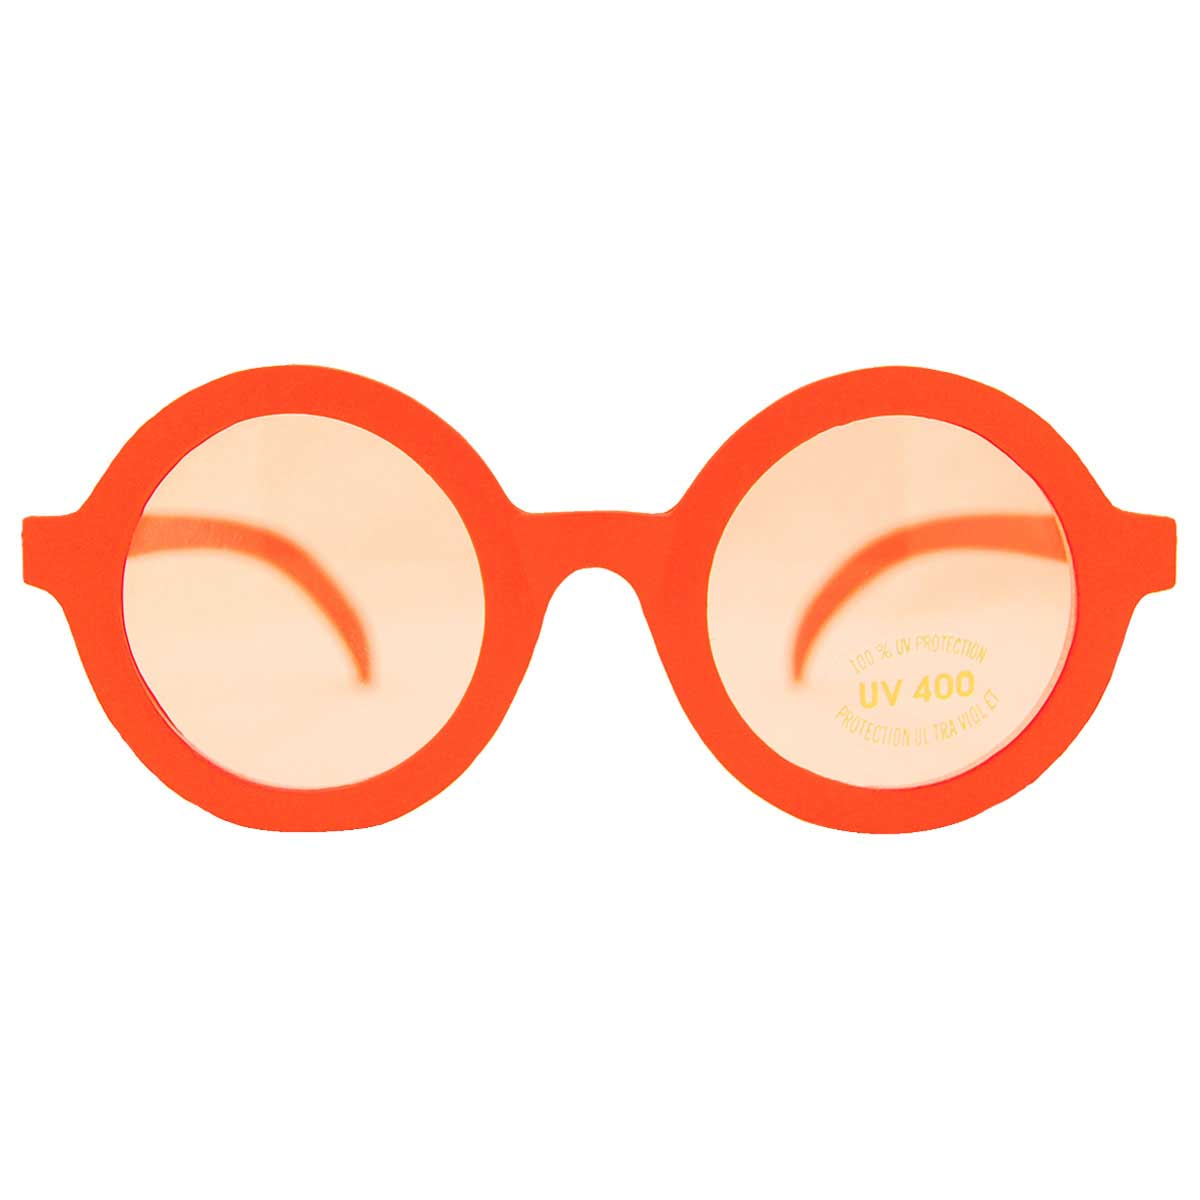 Ronde wc bril kopen online internetwinkel - Wc oranje ...